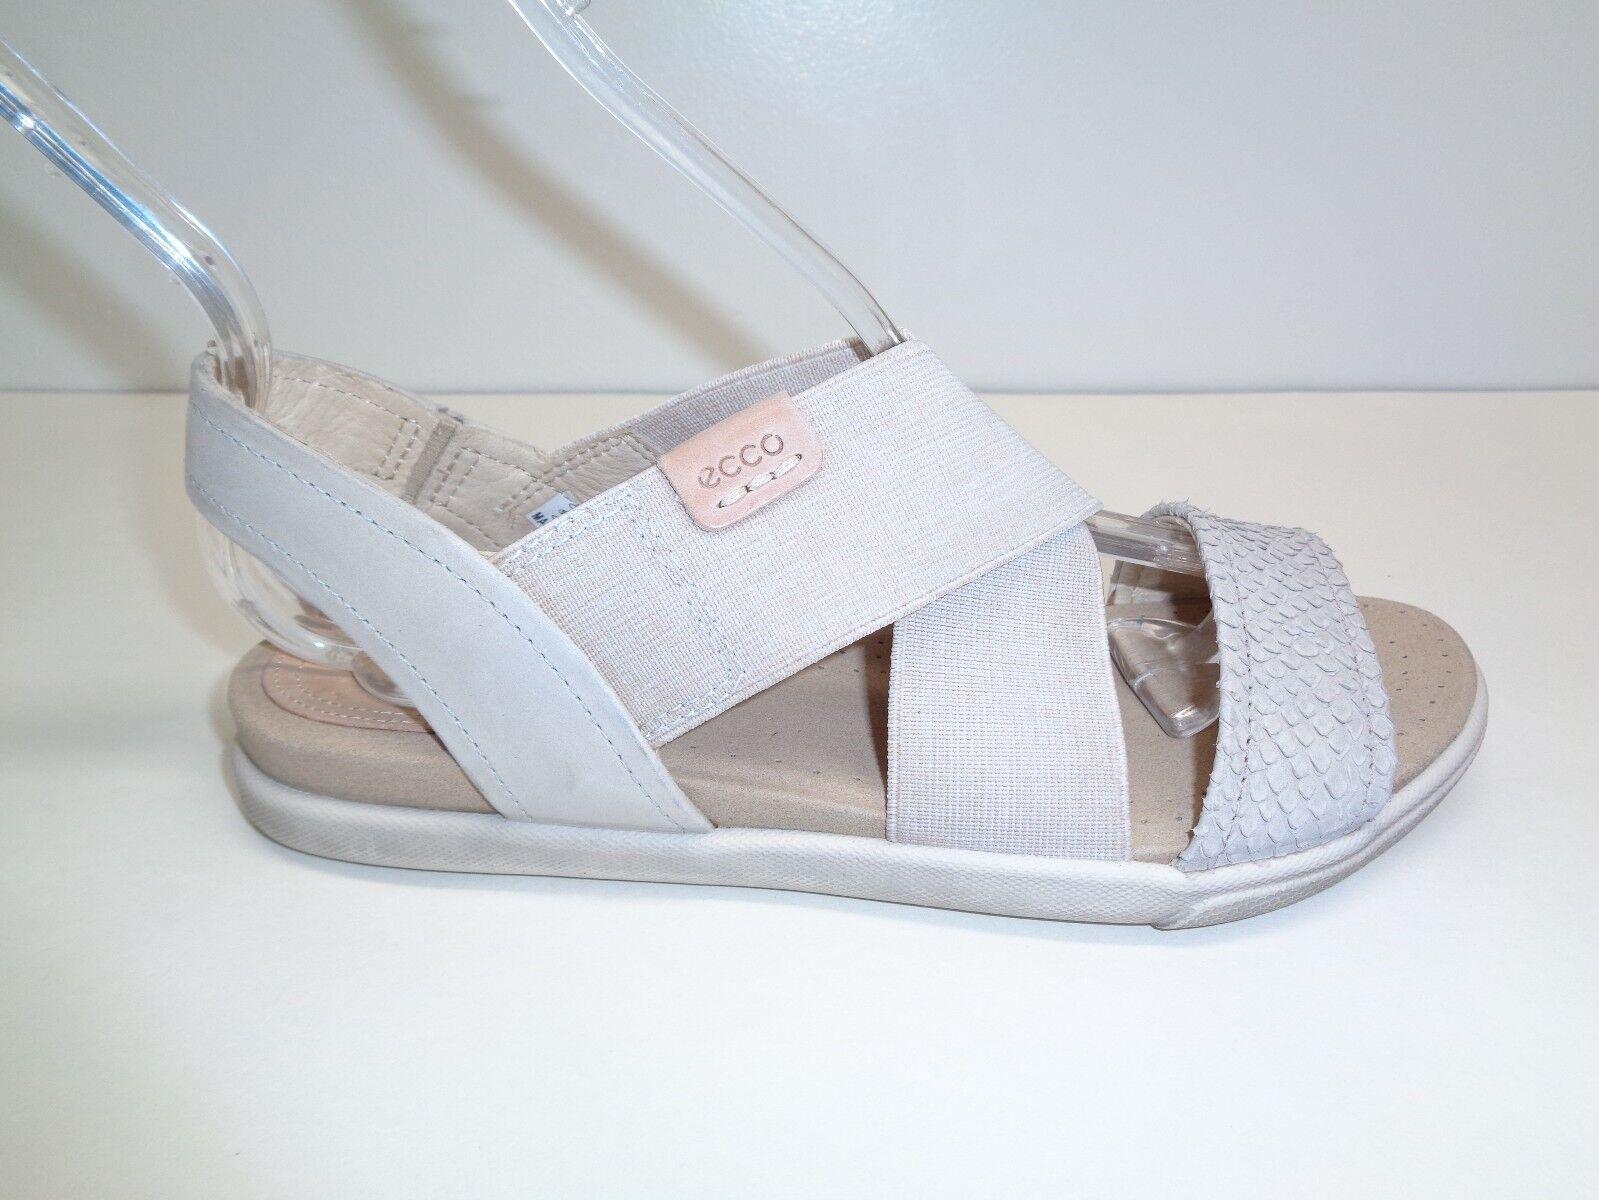 Ecco Größe 5 to 5.5 DAMARA 2-STRAP Moon Rock  Leder Sandales NEU Damenschuhe Schuhes